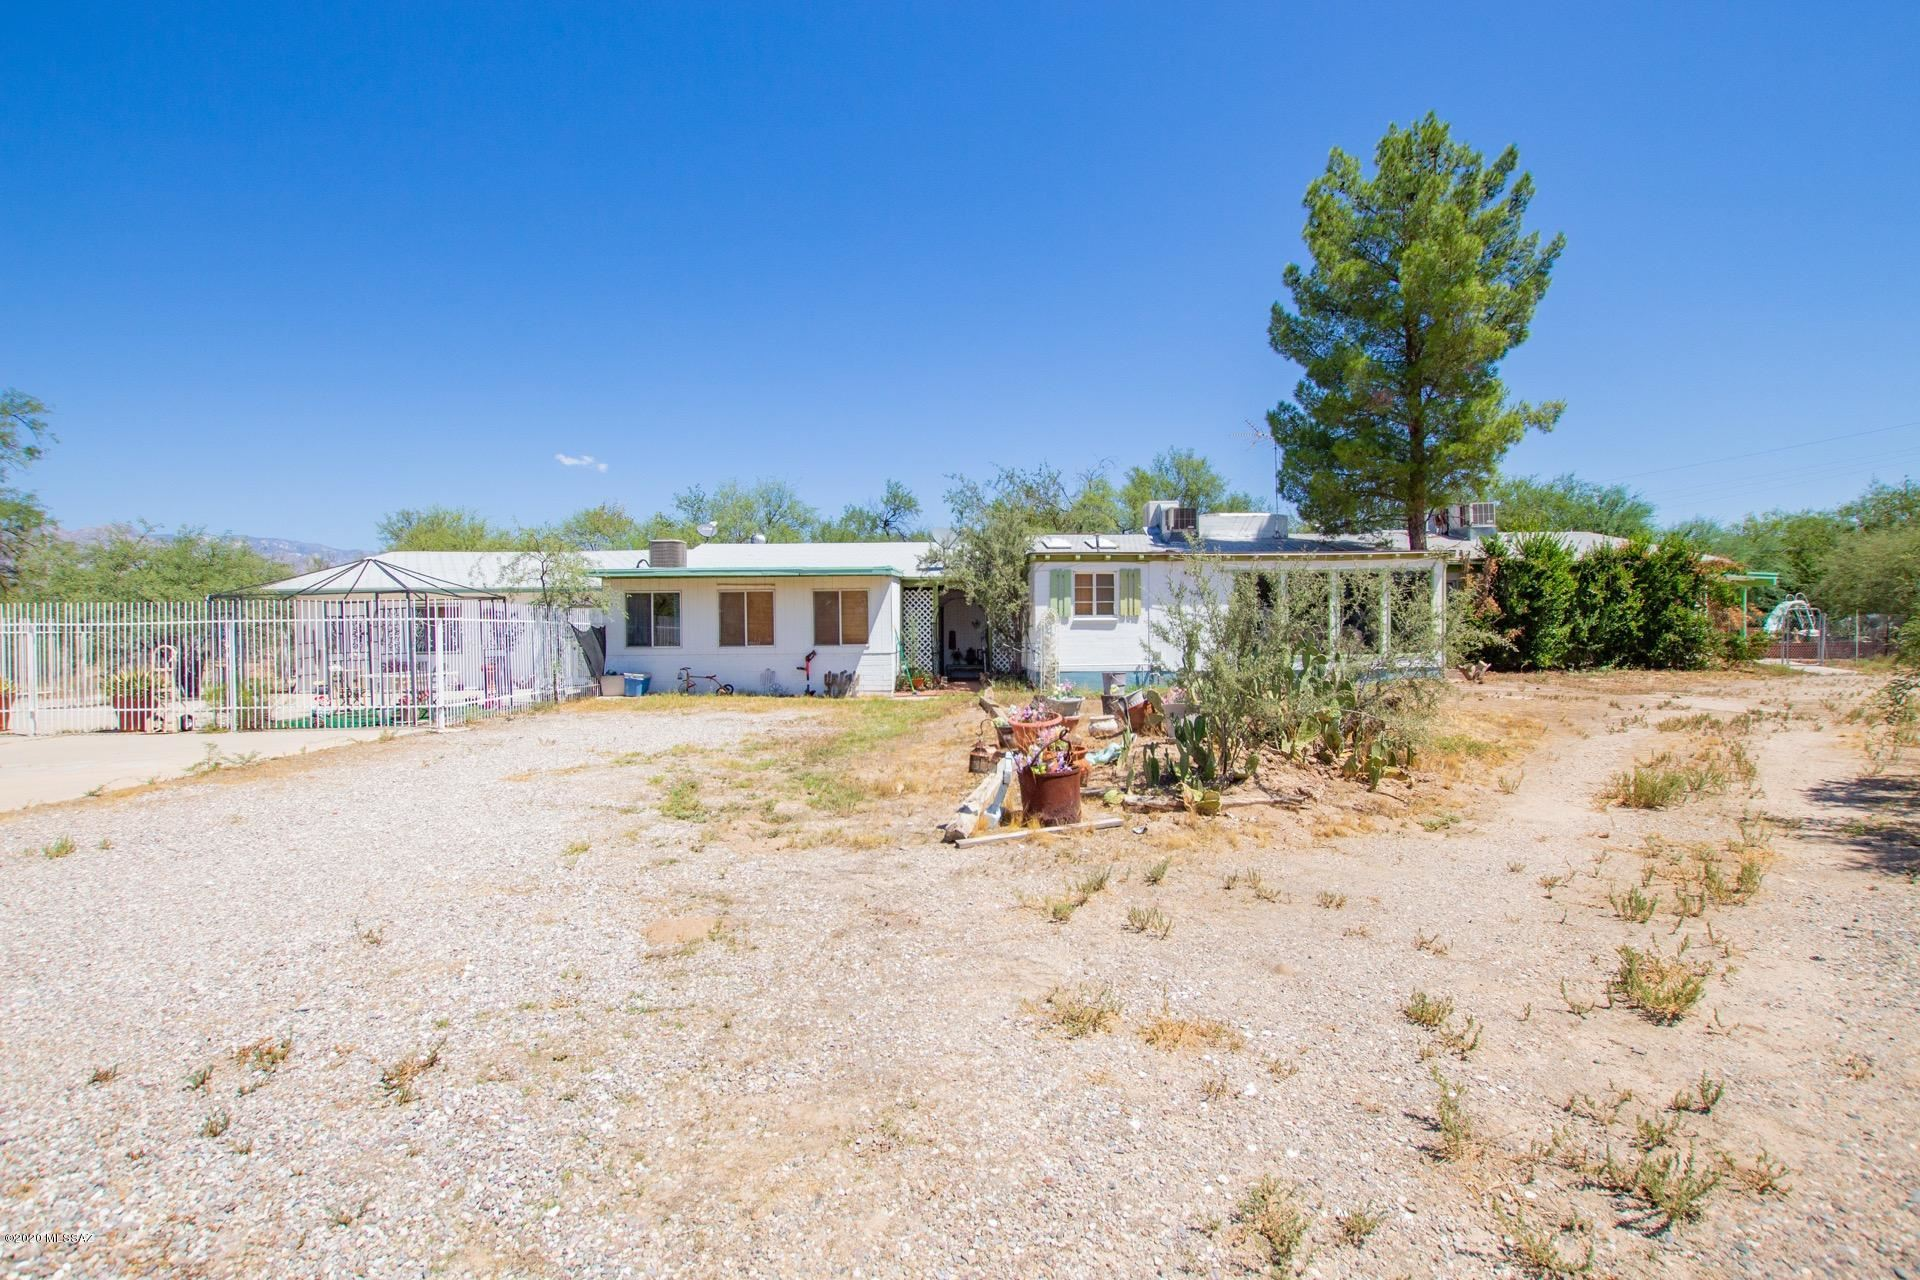 8440 E Tanque Verde Road, Tucson, AZ 85749 - MLS#: 22022193